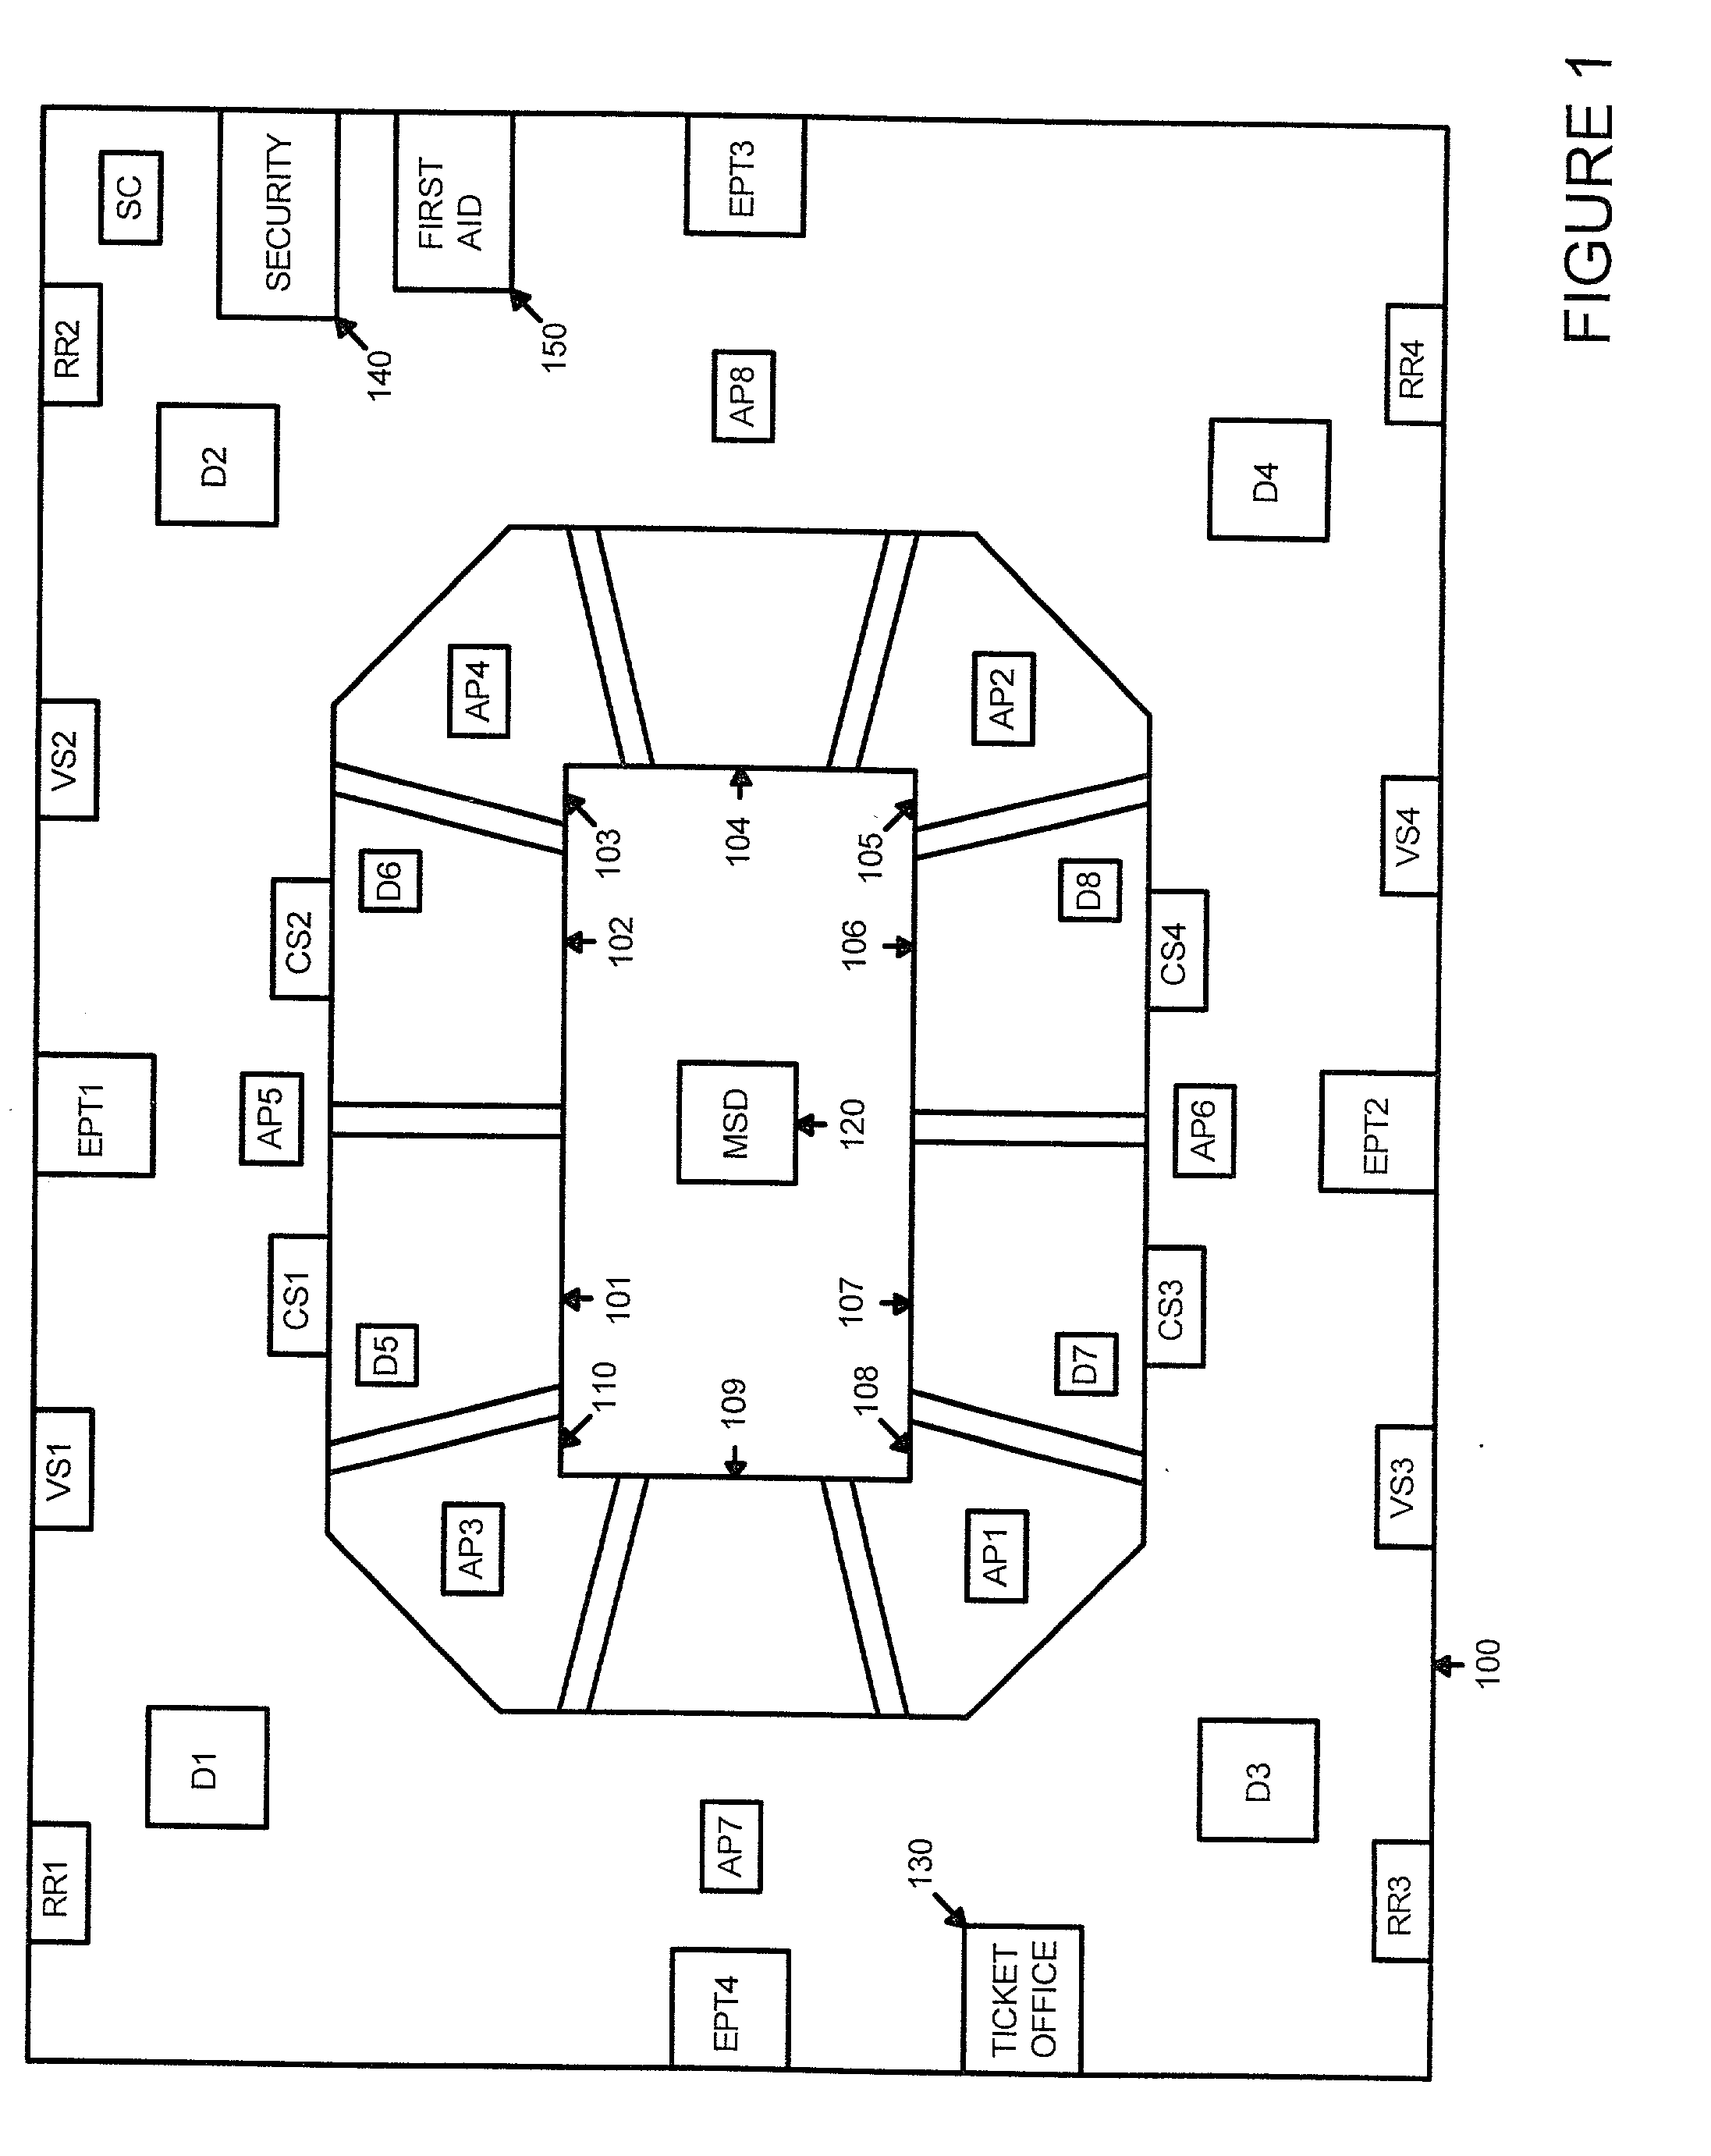 70 mustang ignition wiring diagram furthermore 72 monte carlo wiring diagram likewise 69 vw bug wiring